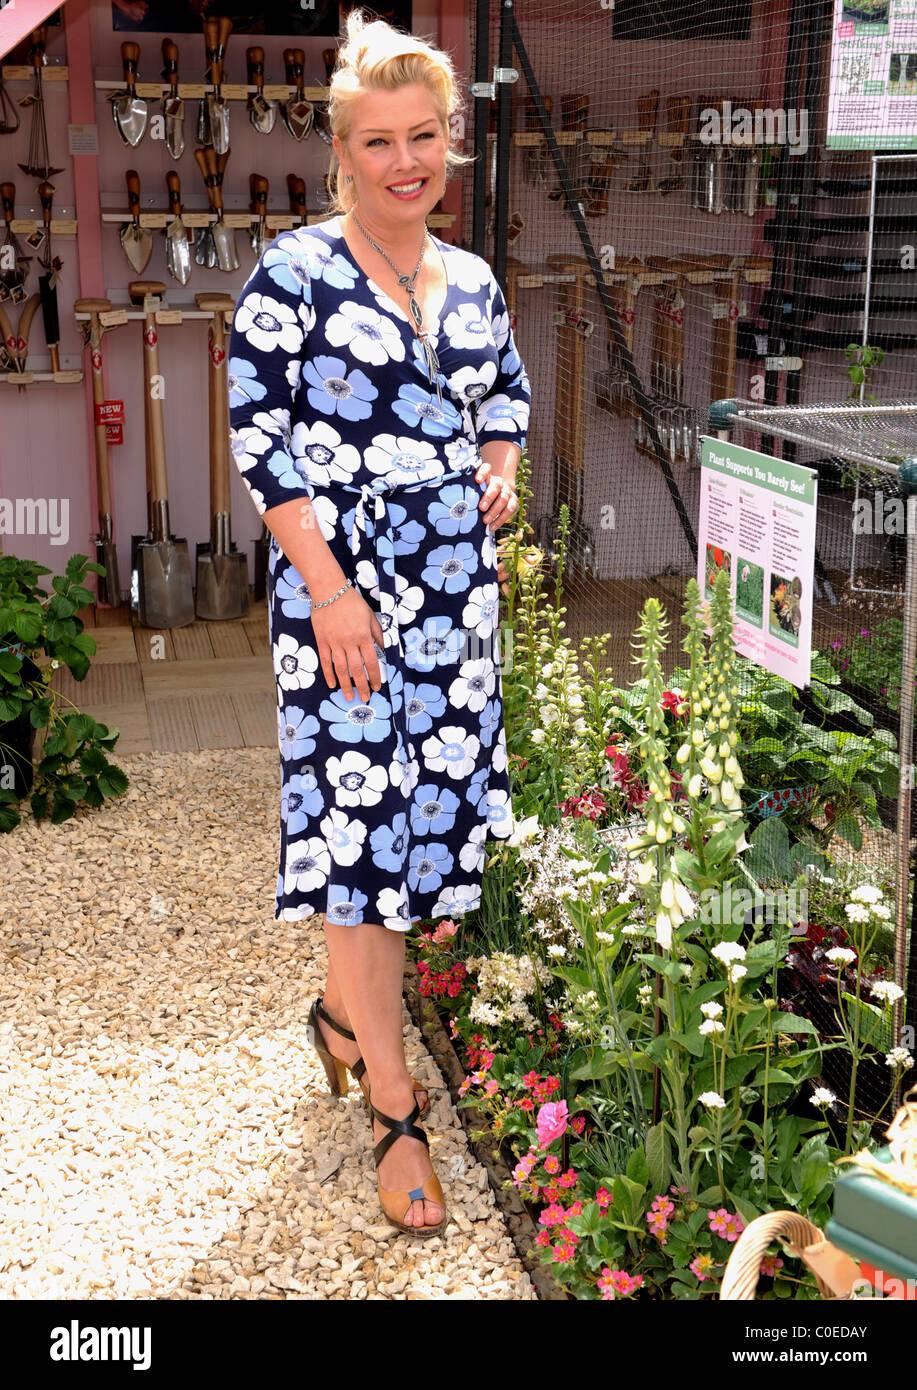 kim wilde at chelsea flower show londonengland 190508 stock image - Wilde Garden